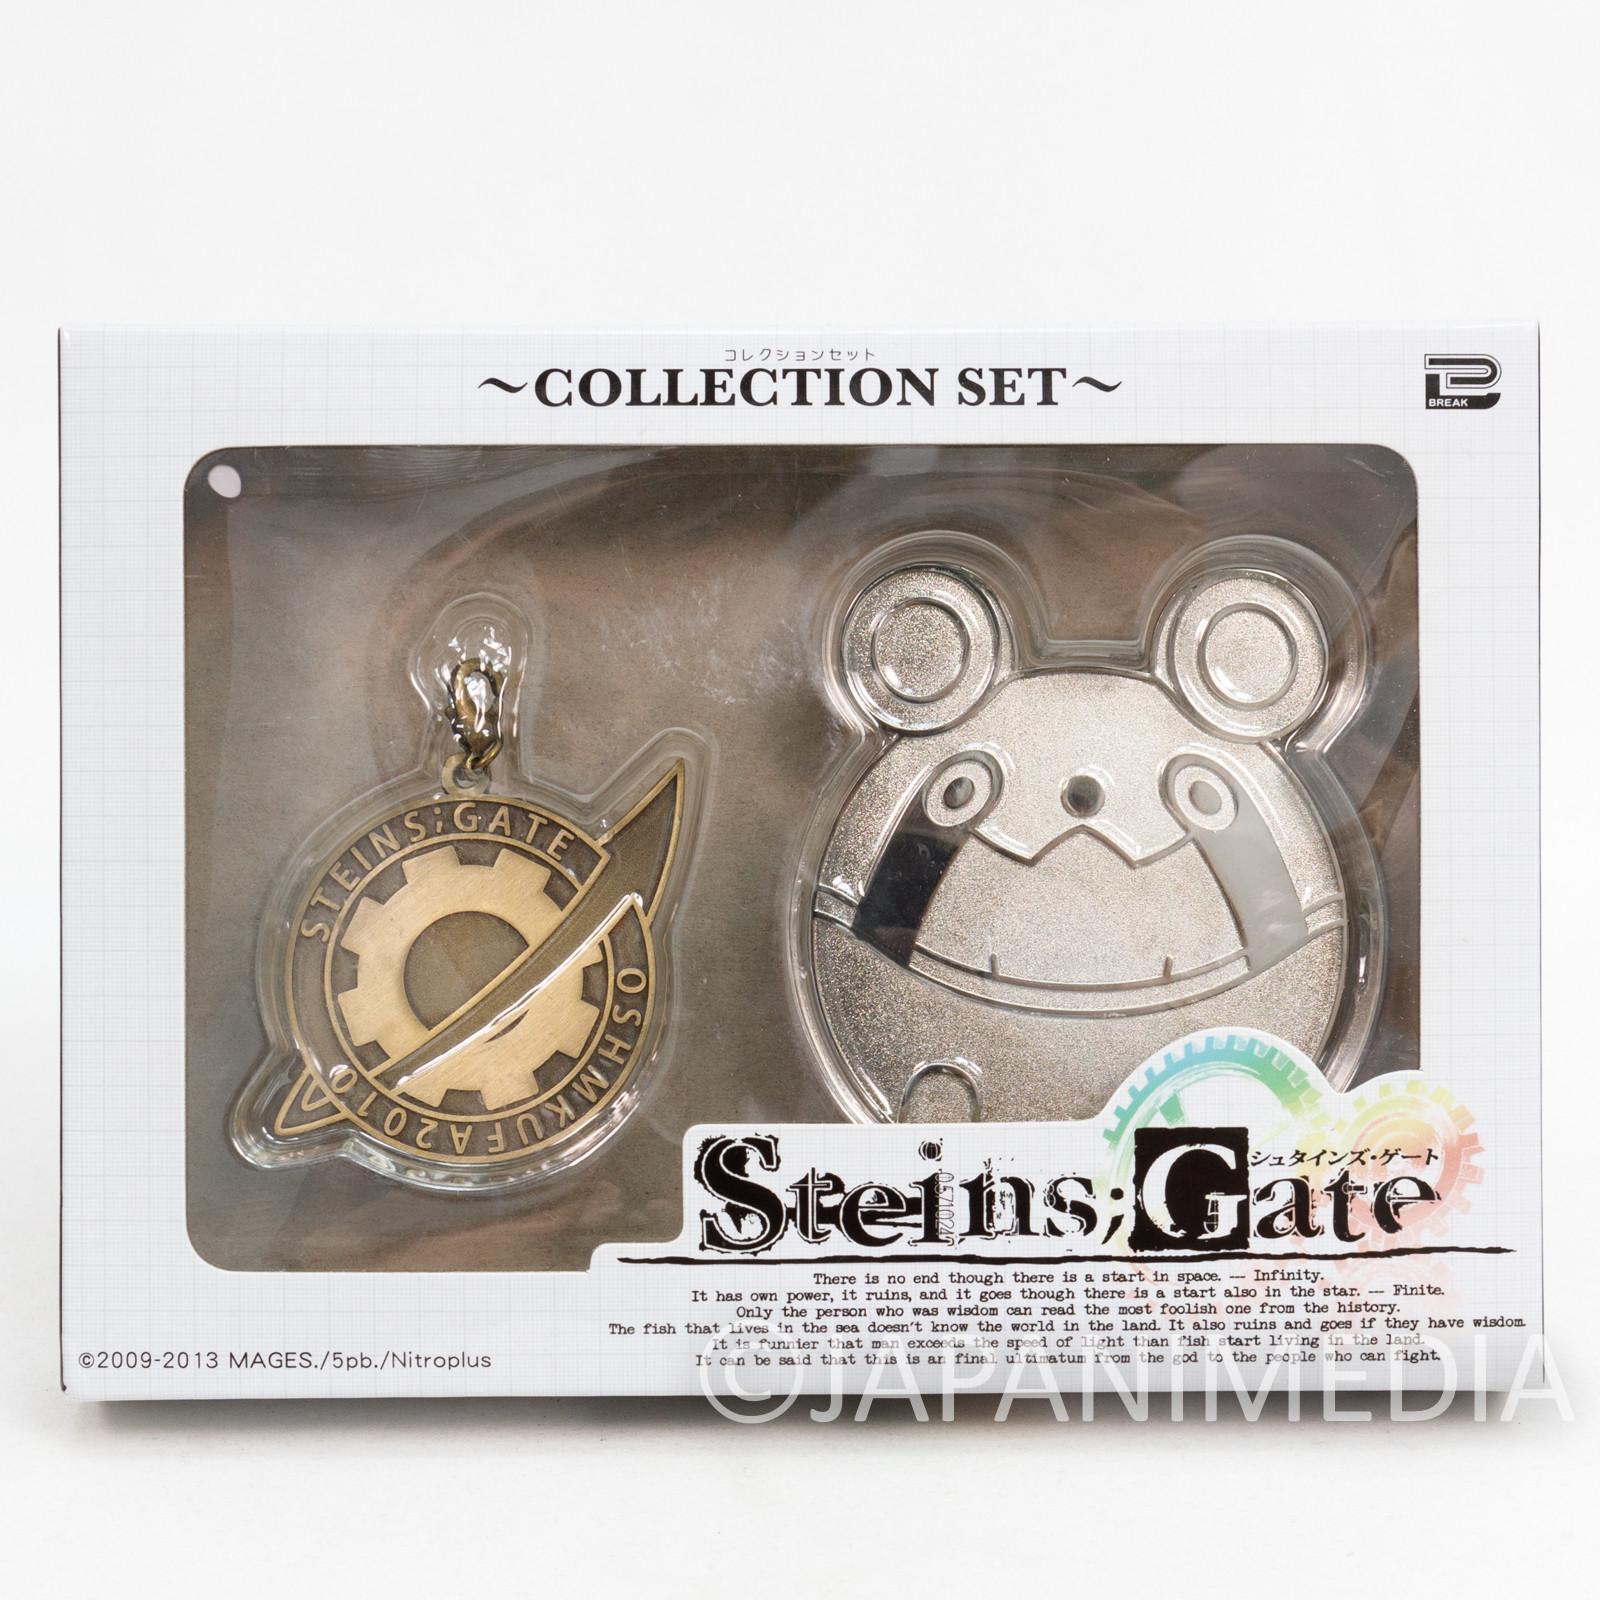 Steins ; Gate Silver Upa Pins & Labomen Mark Mascot Charm Set JAPAN ANIME